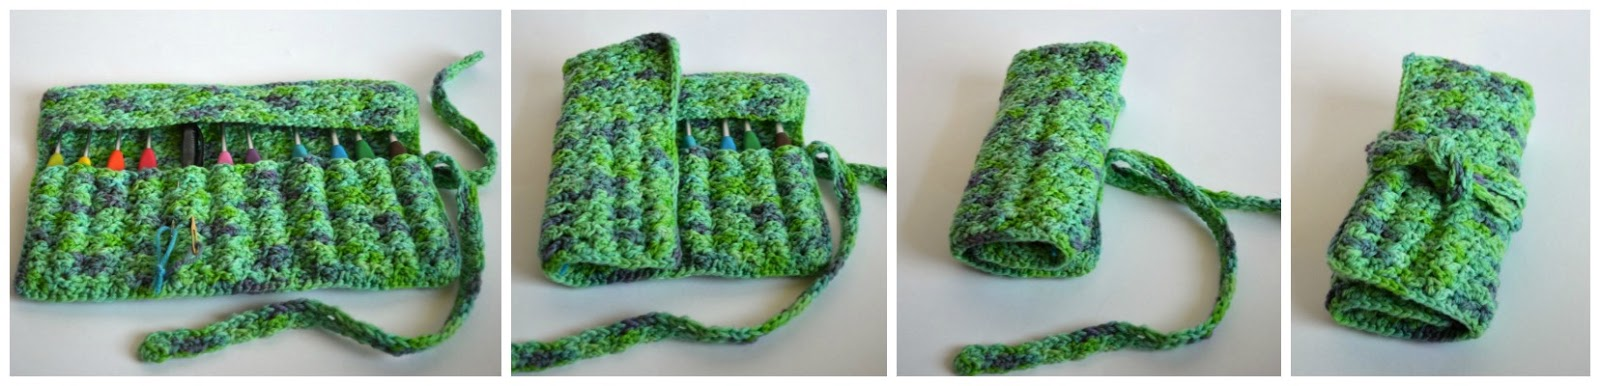 Crochet Dynamite Clover Amour Hook Case